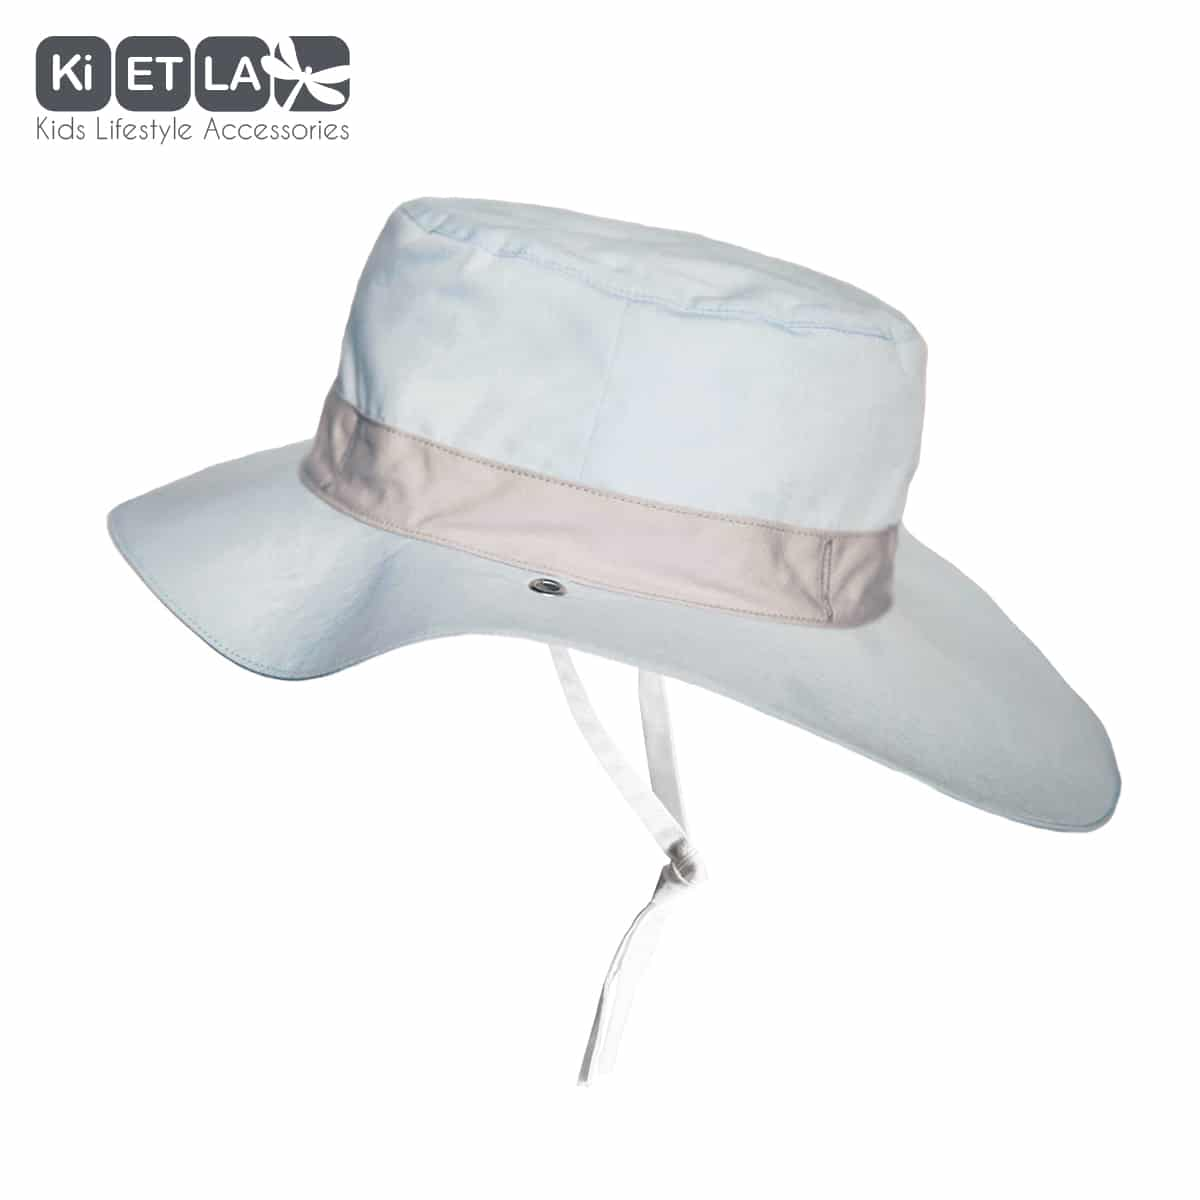 KiETLA obojstranný klobúčik s UV ochranou - 52cm